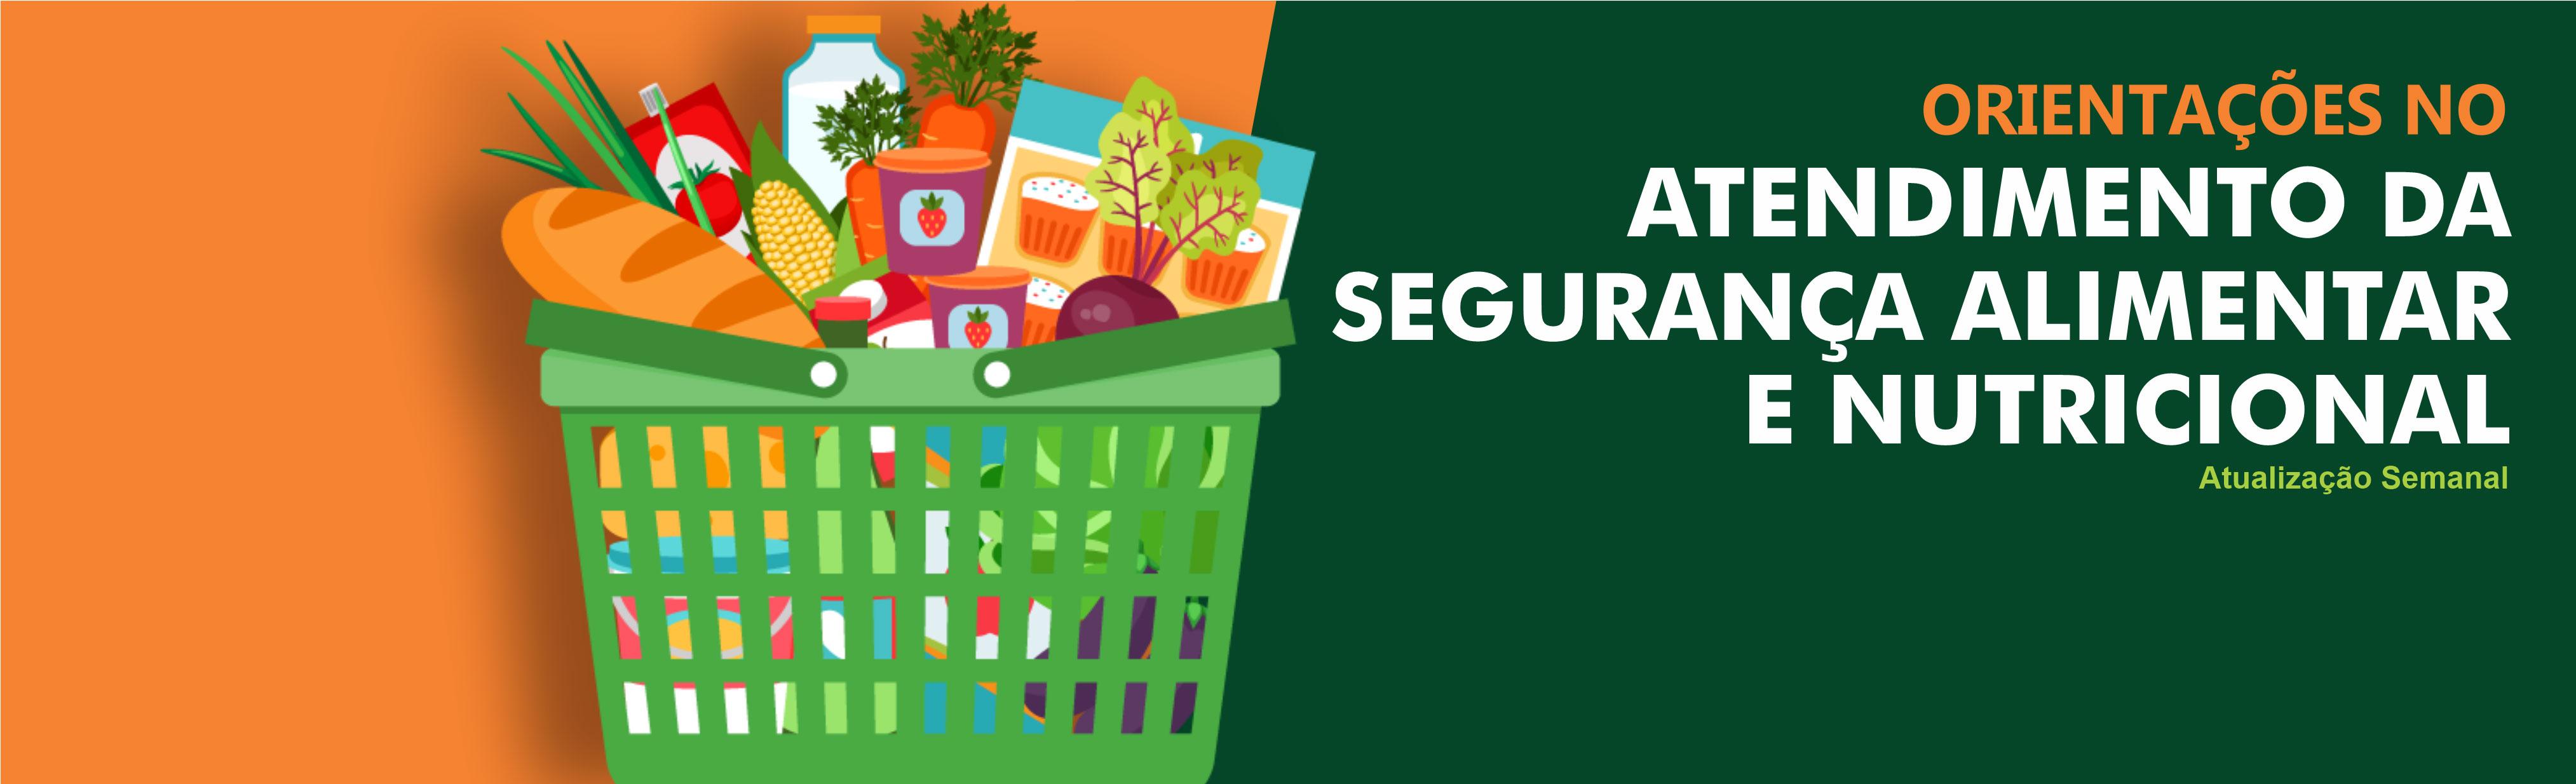 Atendimento segurança alimentar